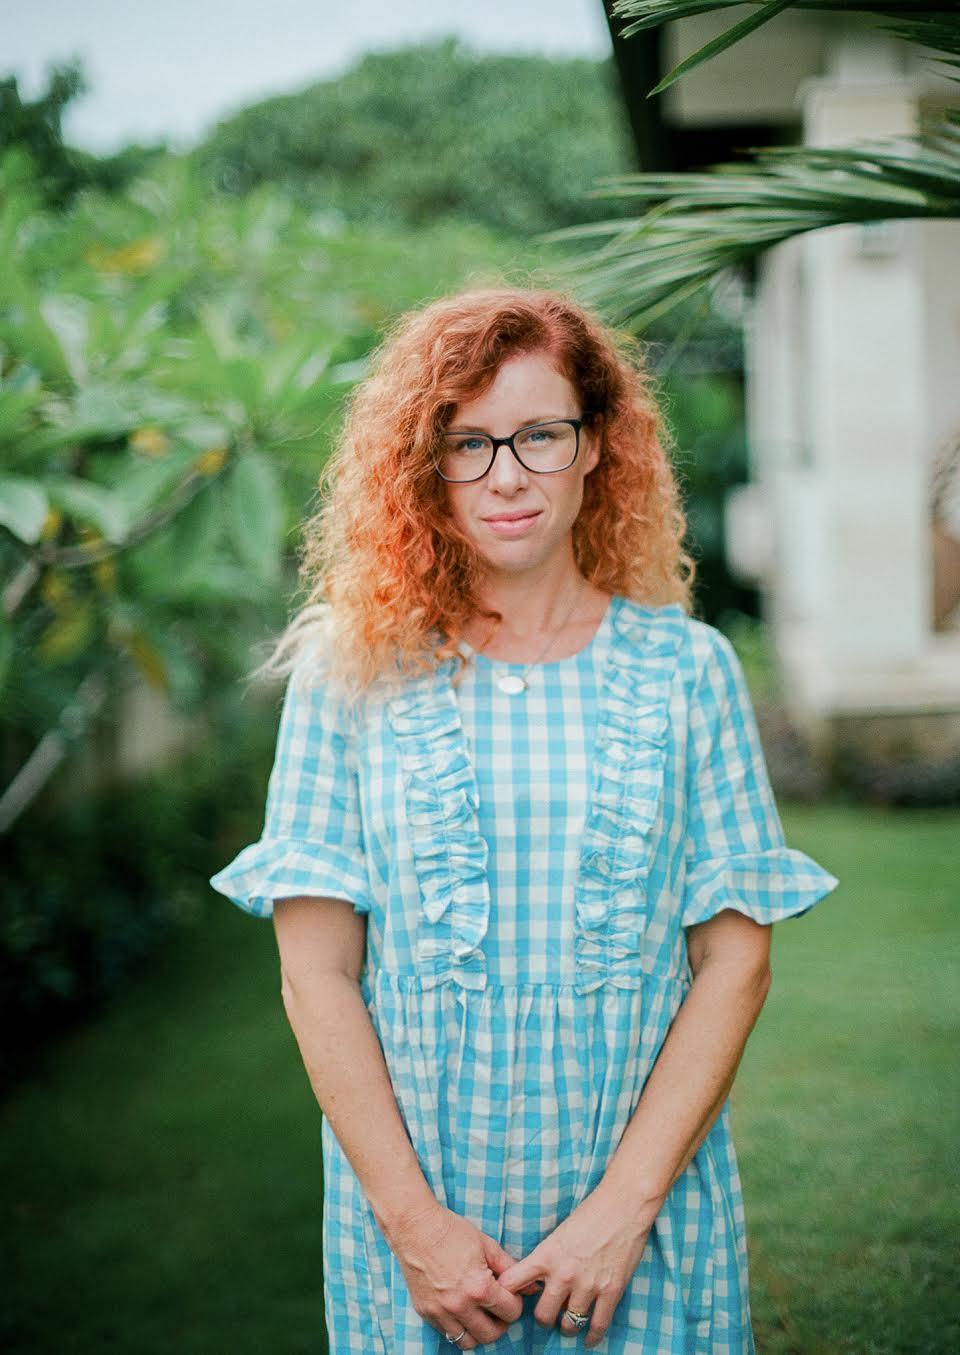 Leah Moore  Sawtell, NSW @leahmoorephoto